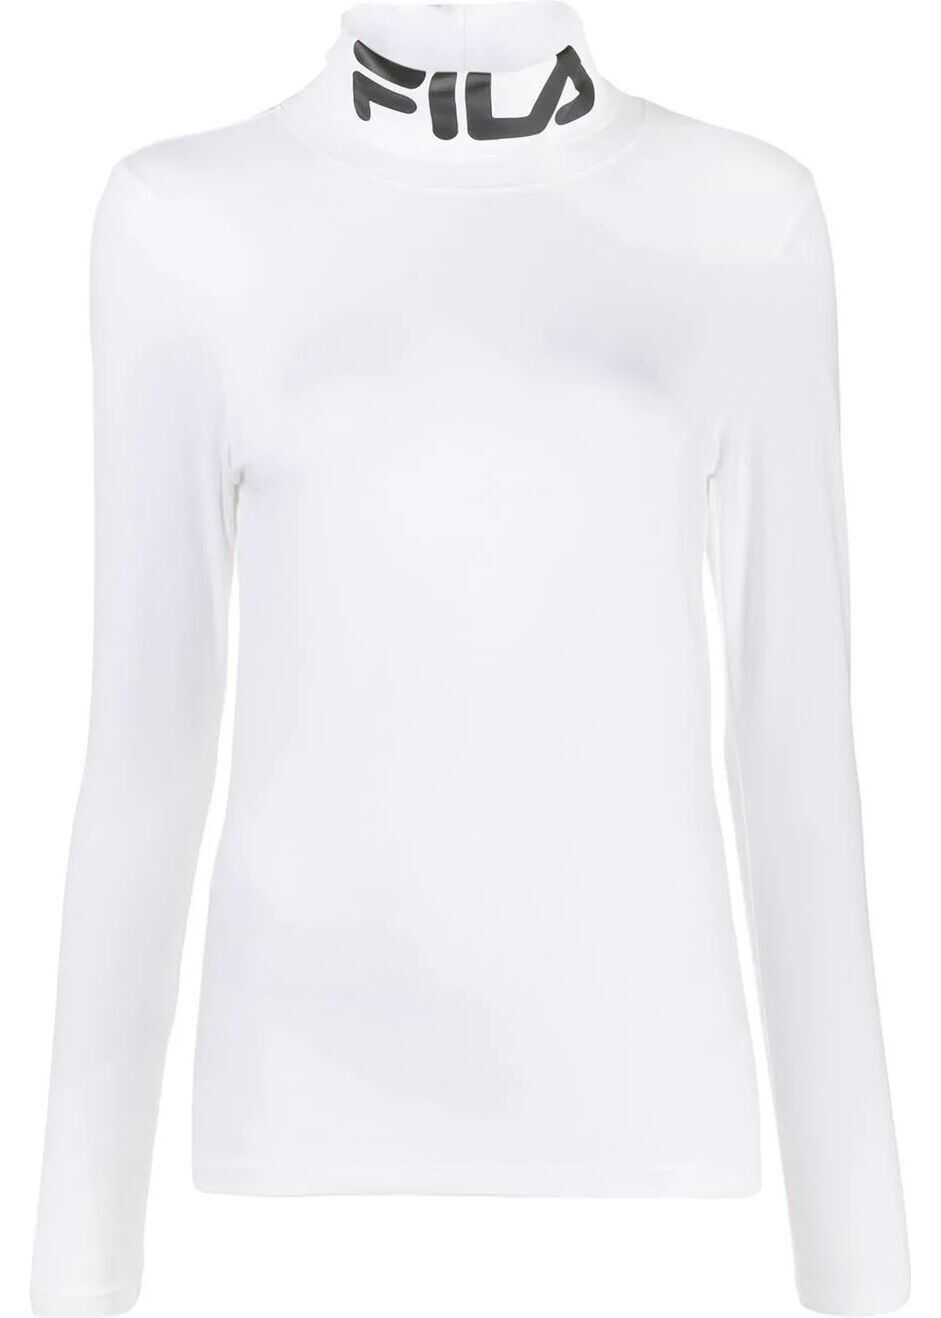 Fila Cotton T-Shirt WHITE